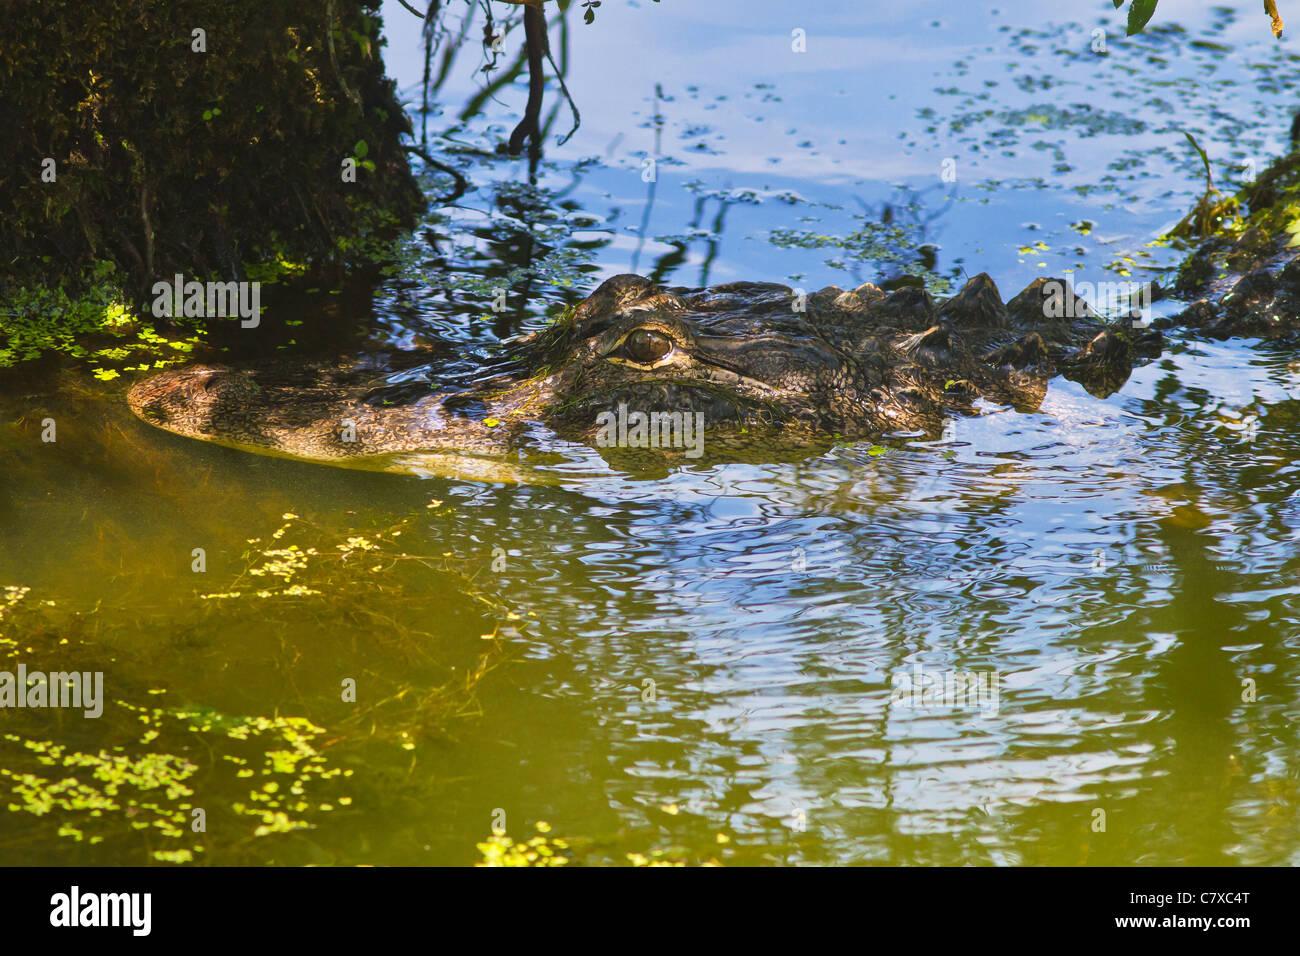 Lurking alligator at Greenfield Lake in Wilmington, North Carolina - Stock Image